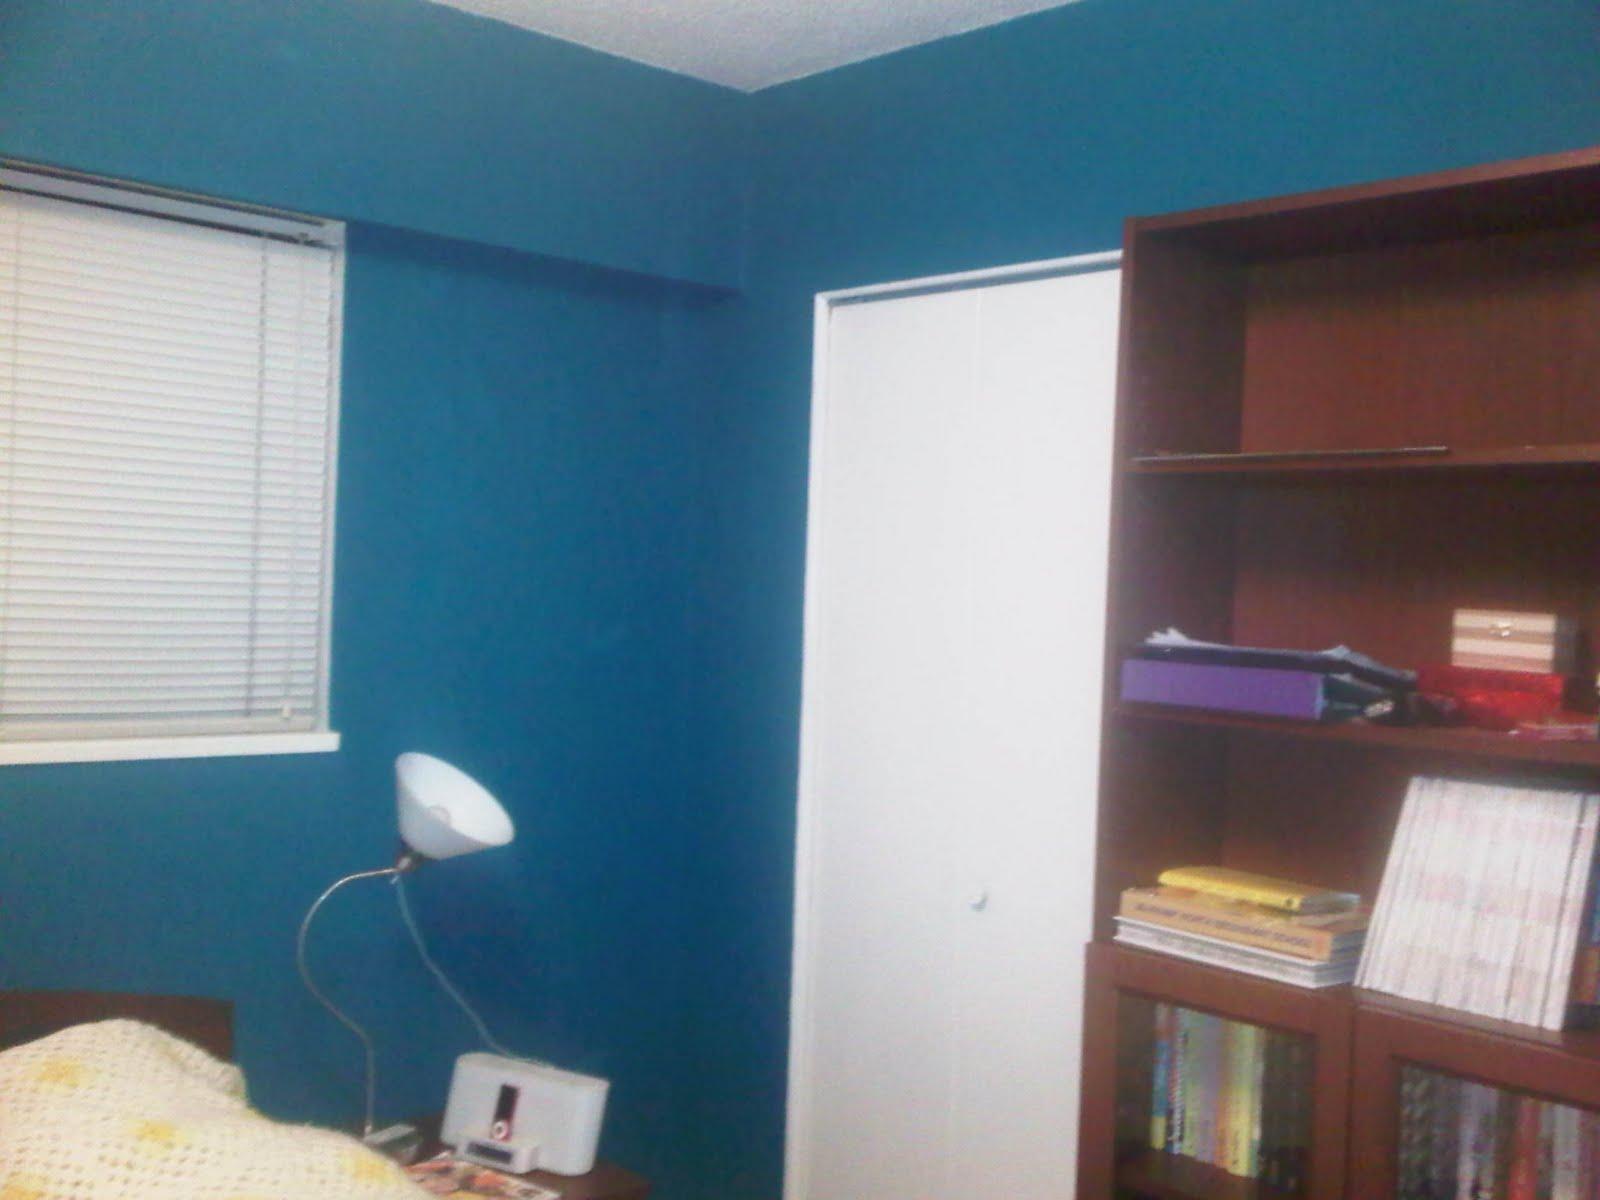 Interior Design - Anything & Everything: My Room!